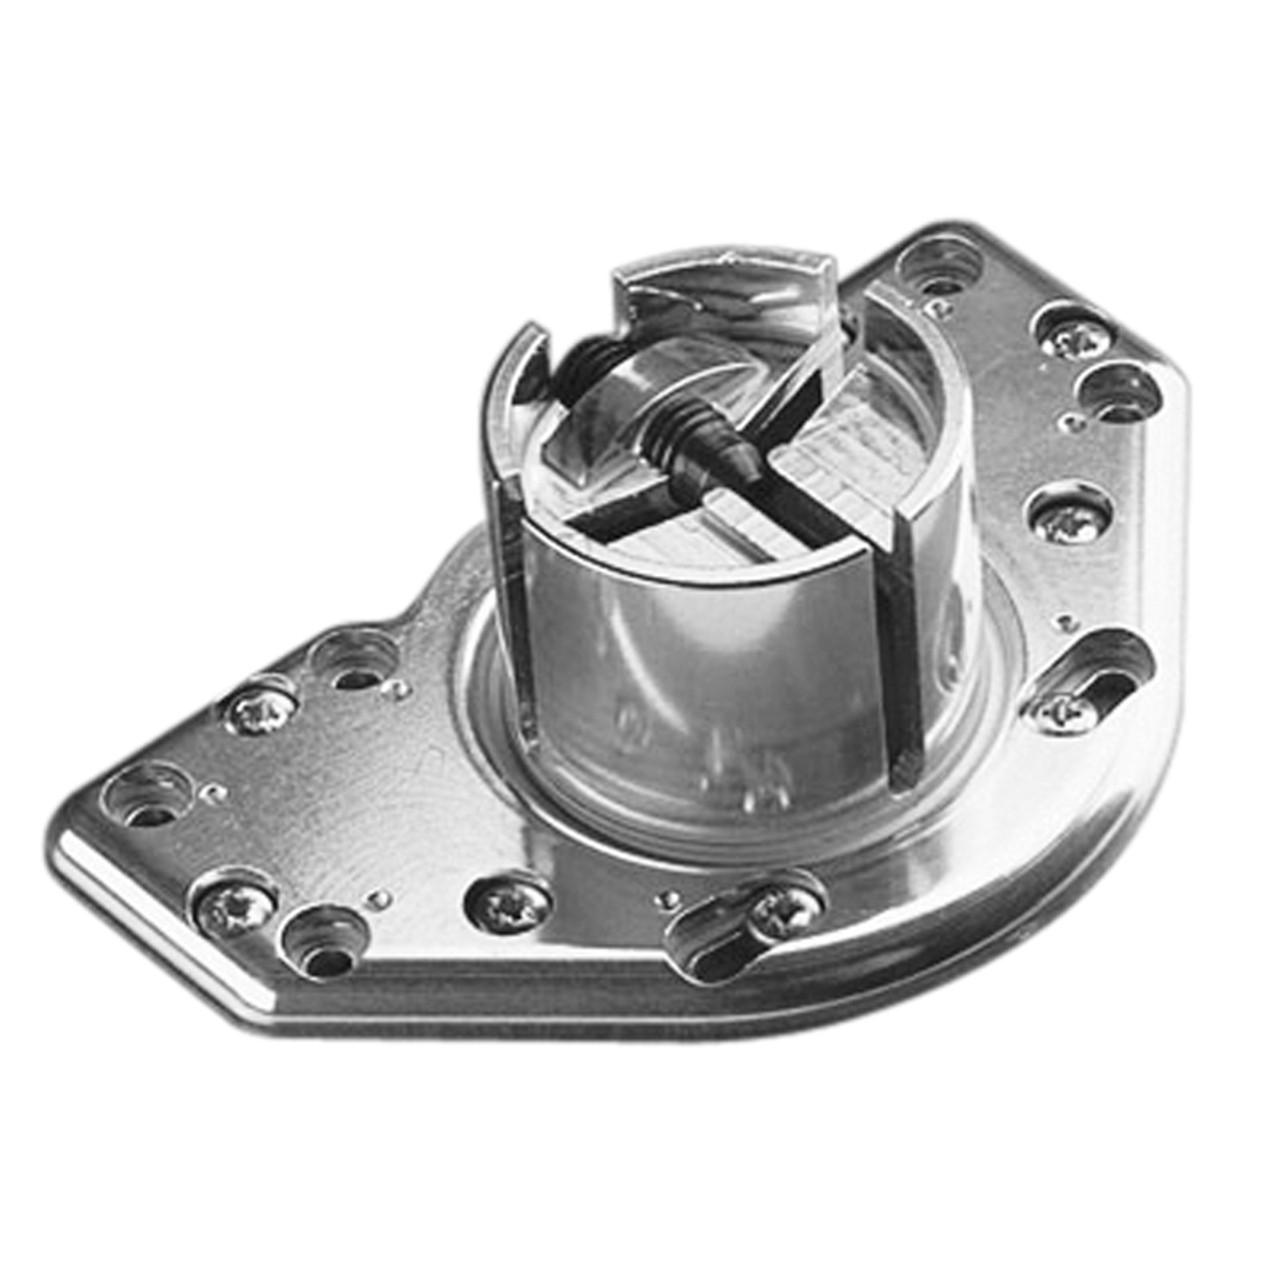 Mounting bracket - replacementtablelegs.com